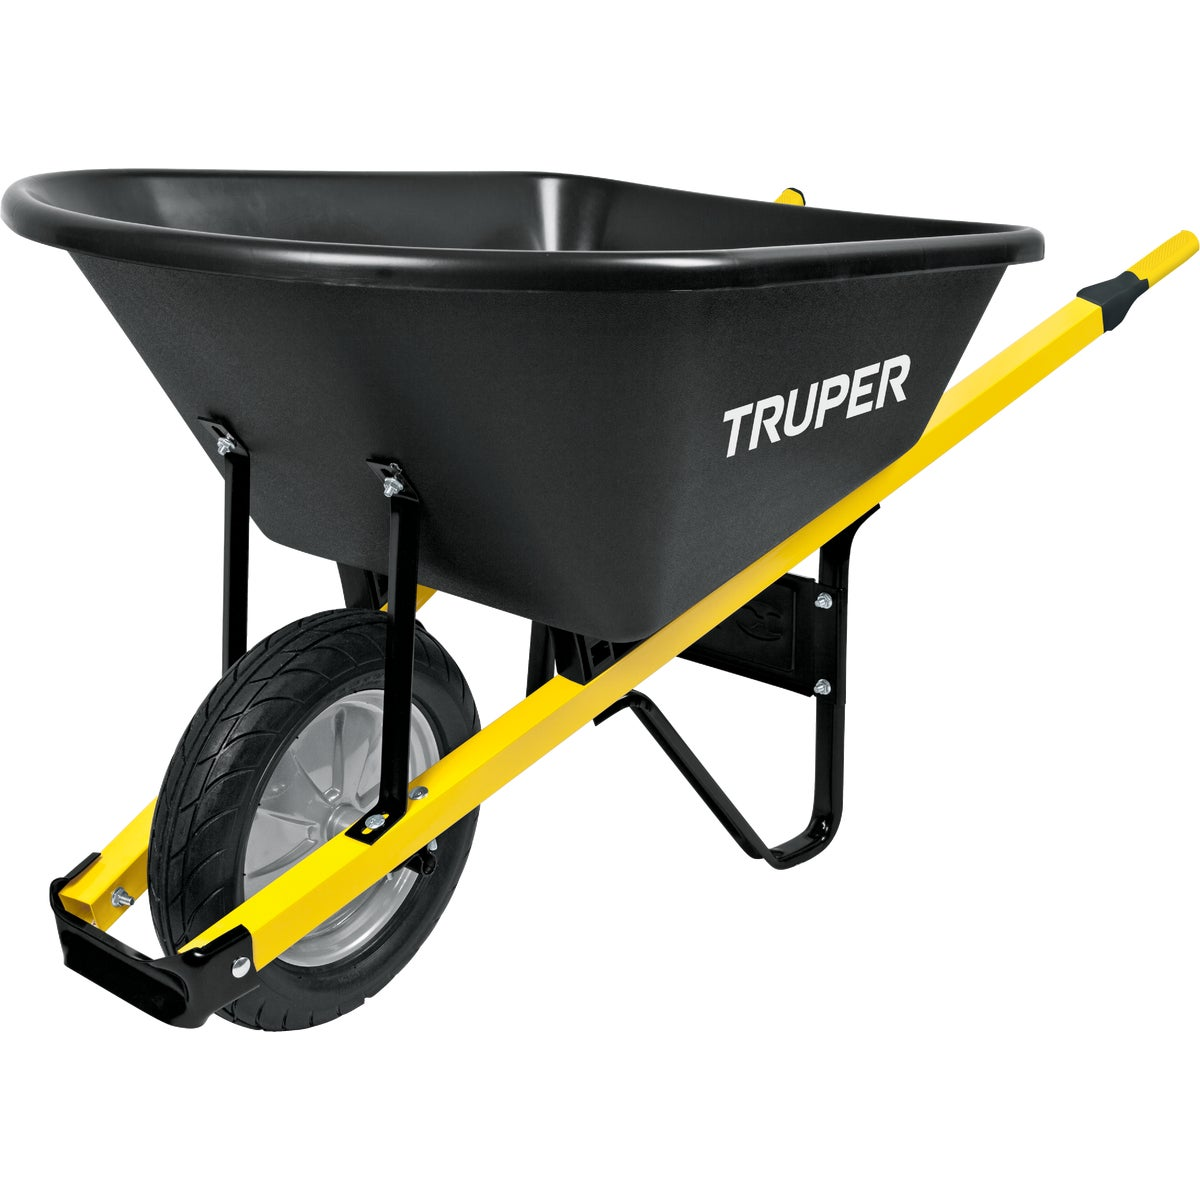 Truper Tru Tough Landscaper Poly Wheelbarrow, TPS-6F